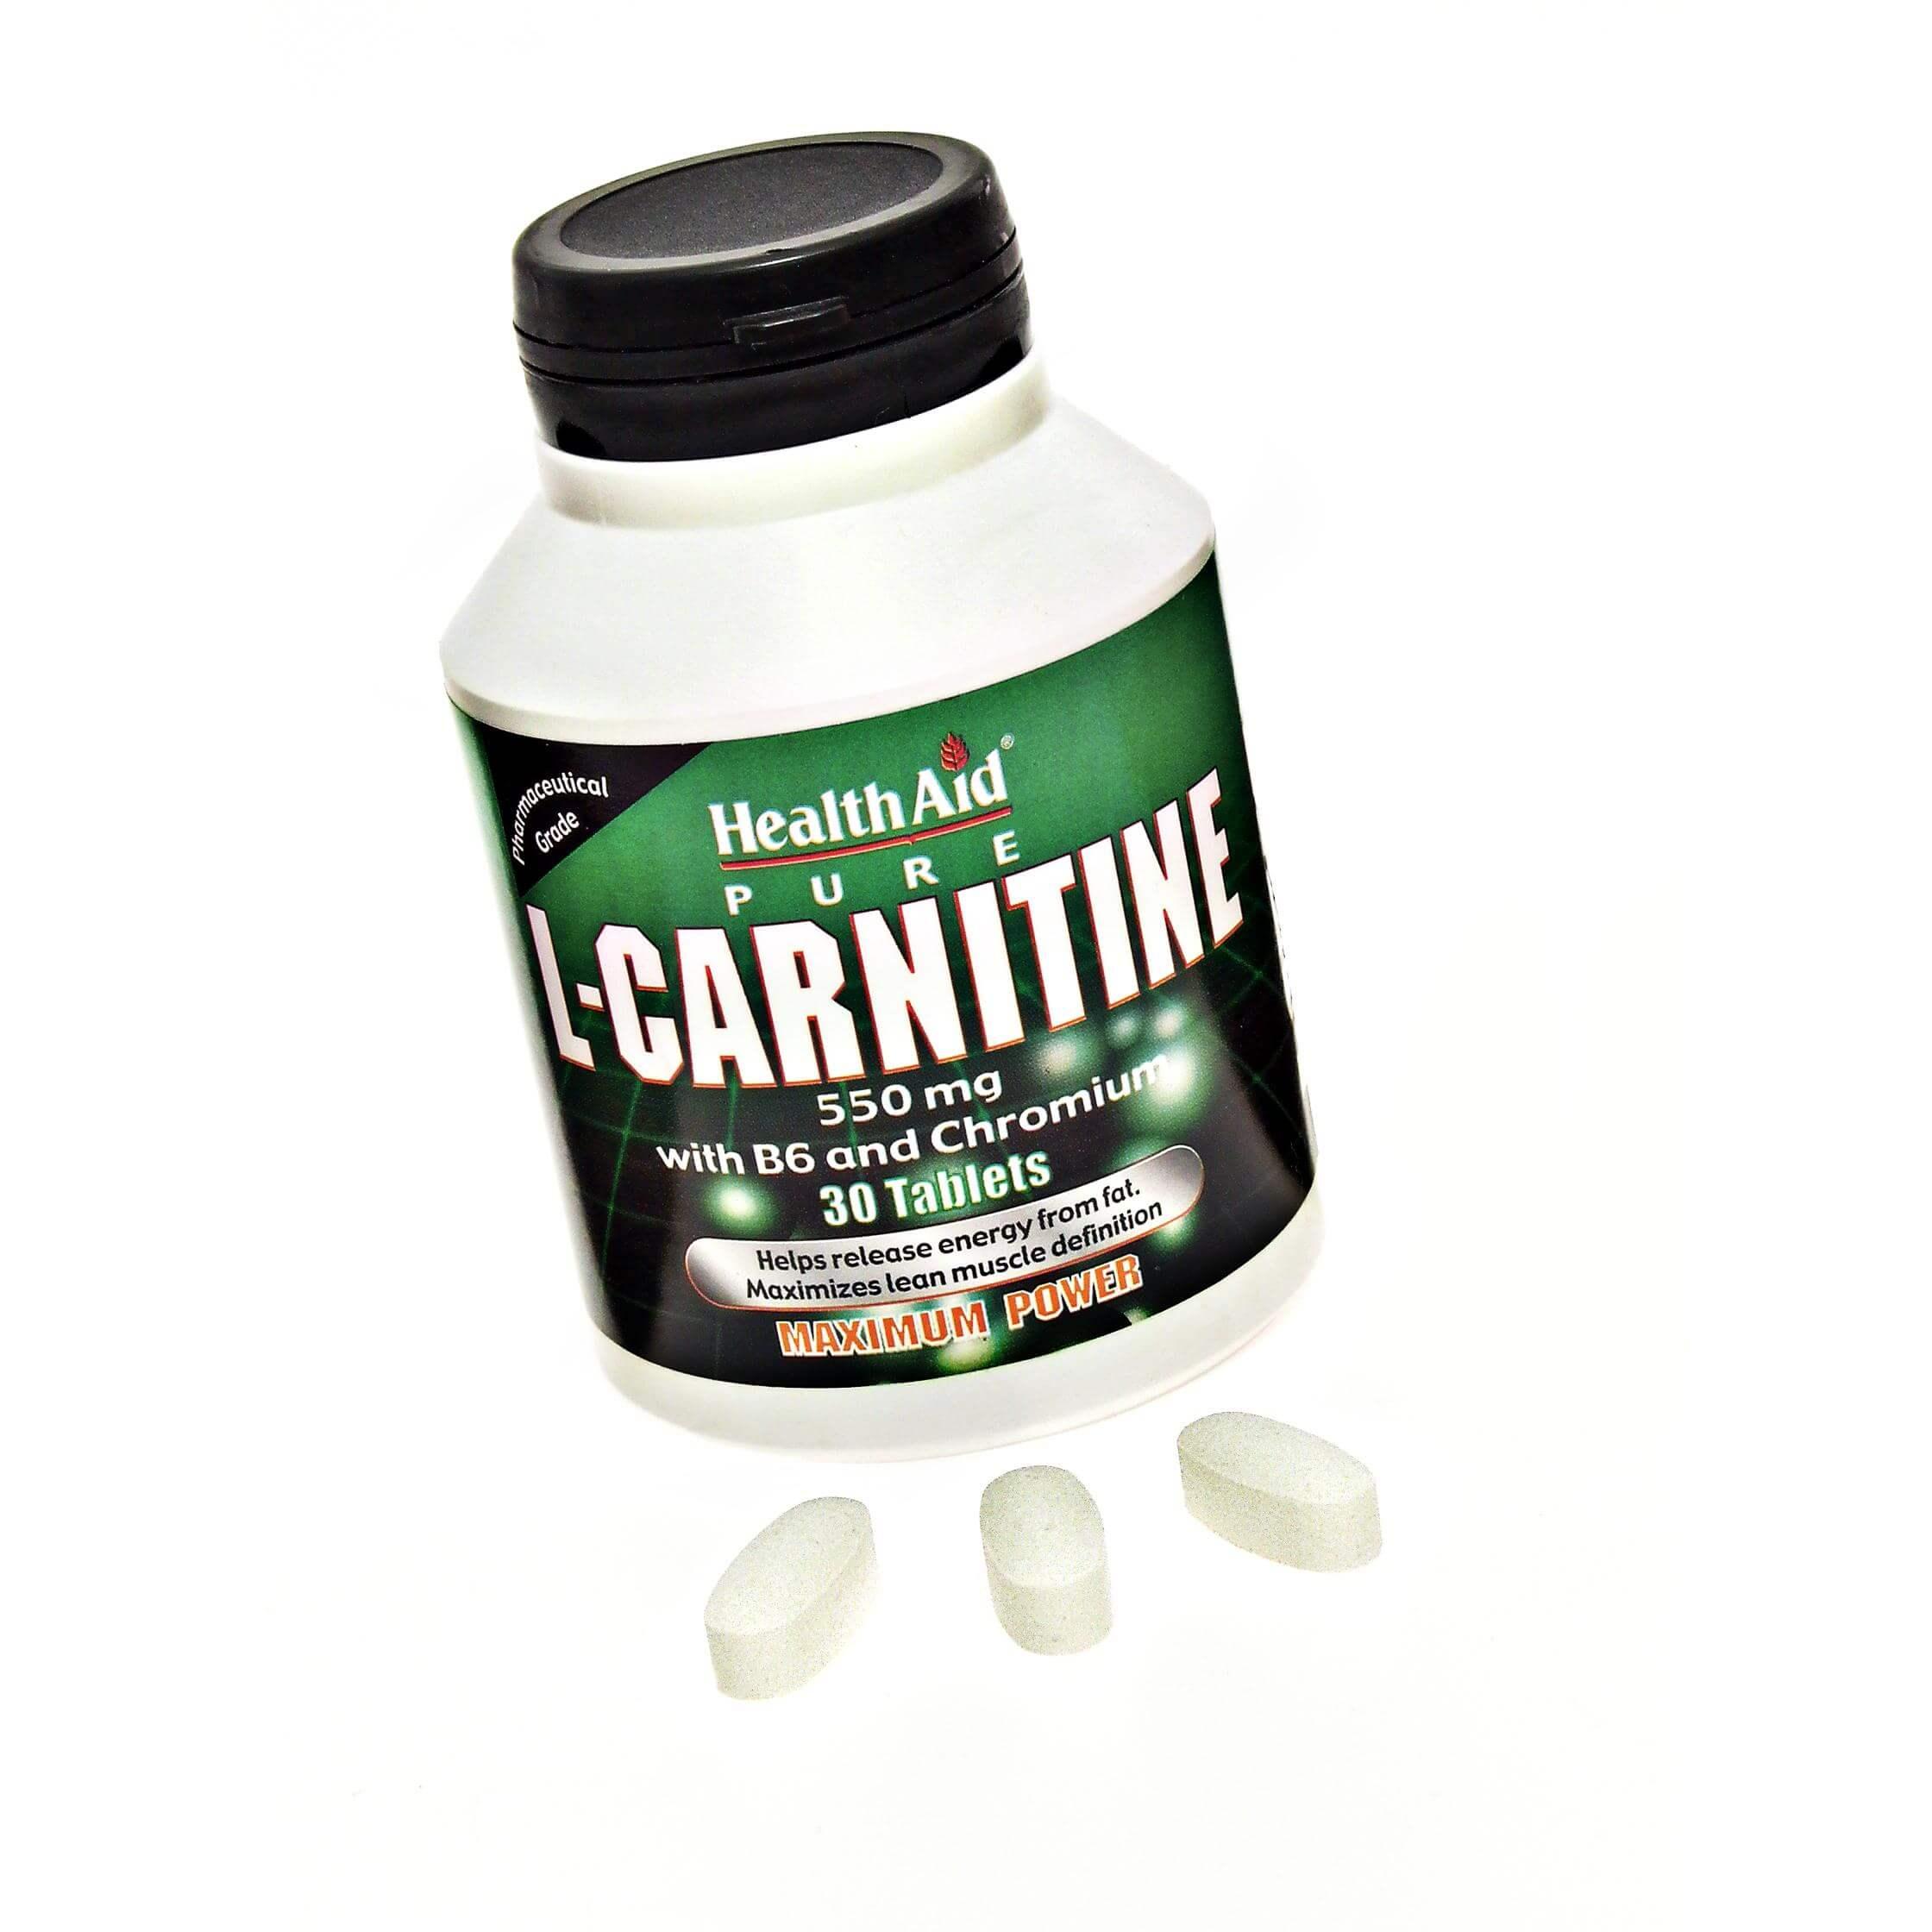 Health Aid L-Carnitine with Vitamin B6 & Chromium Αυξάνει Την Μετατροπή Των Λιπαρών Οξέων Σε Ενέργεια 30 tabs